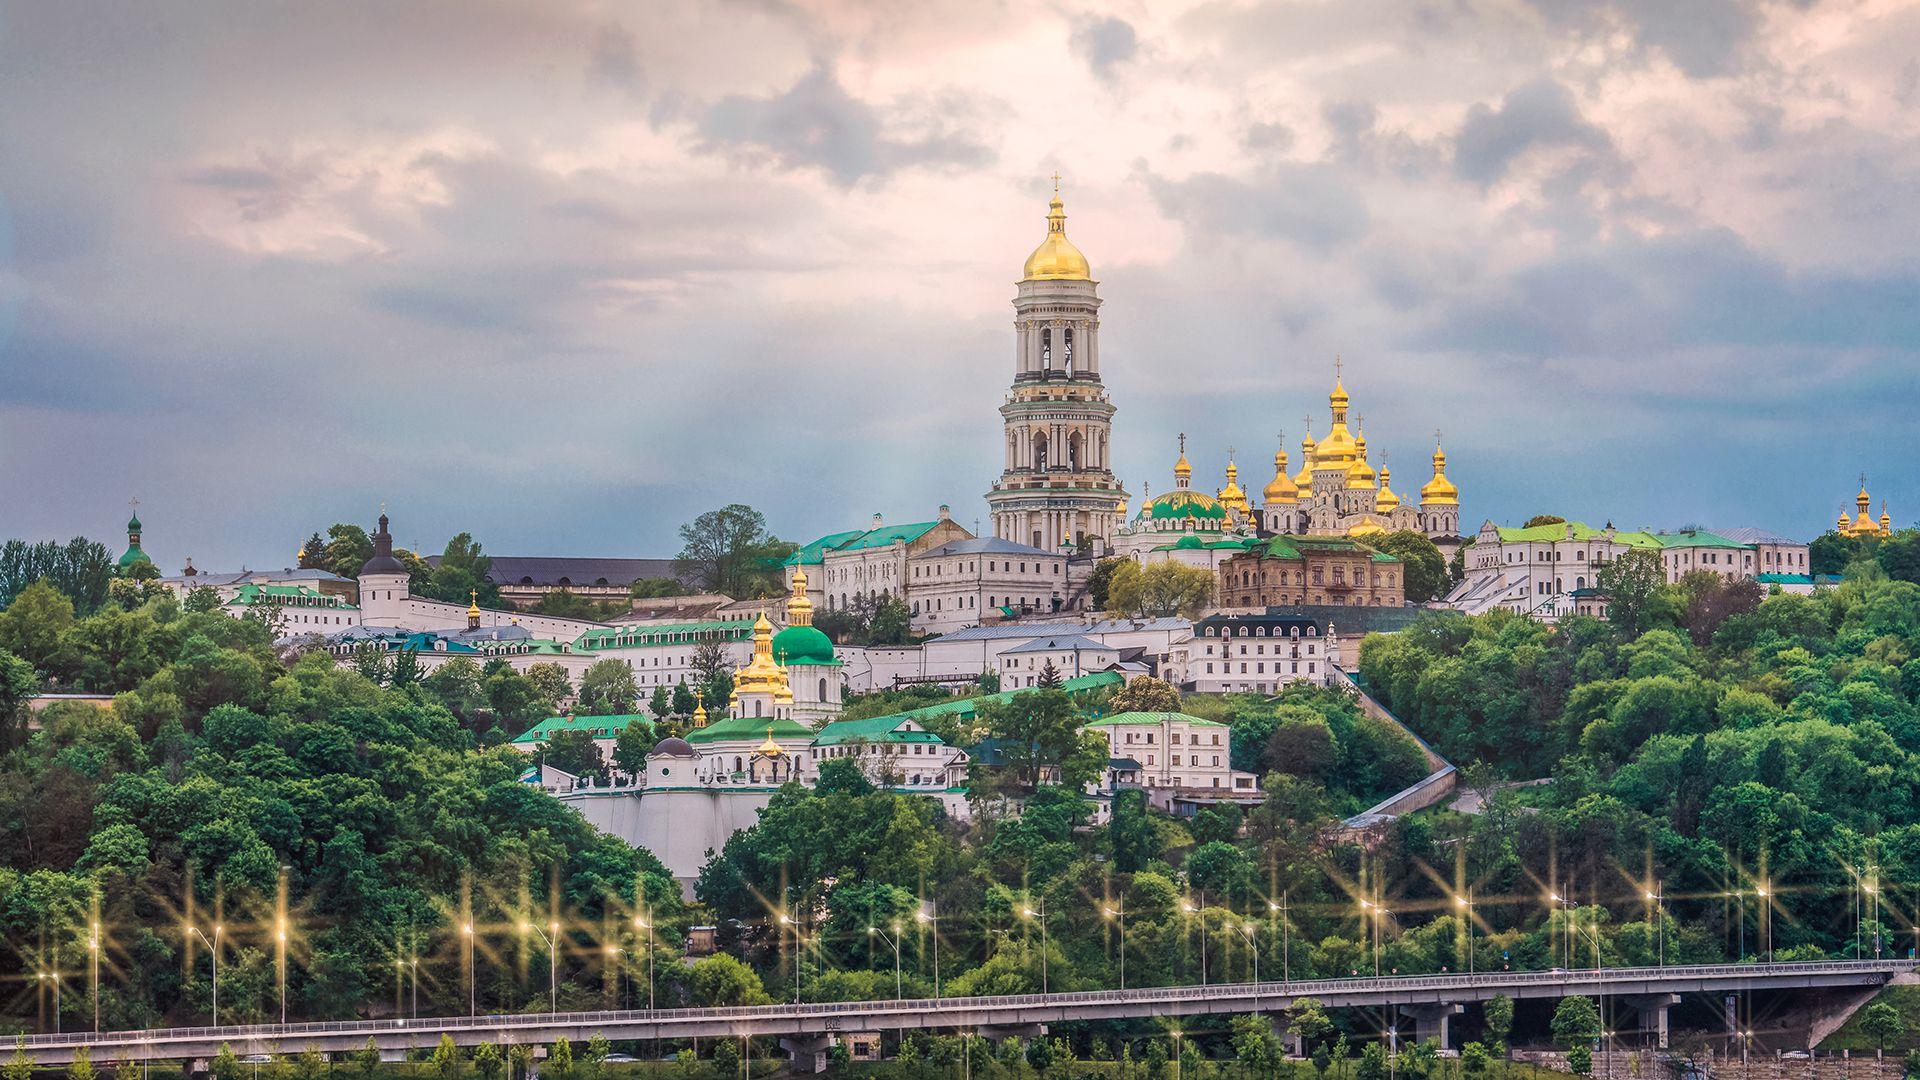 La ciudad de Kiev, capital de Ucrania.